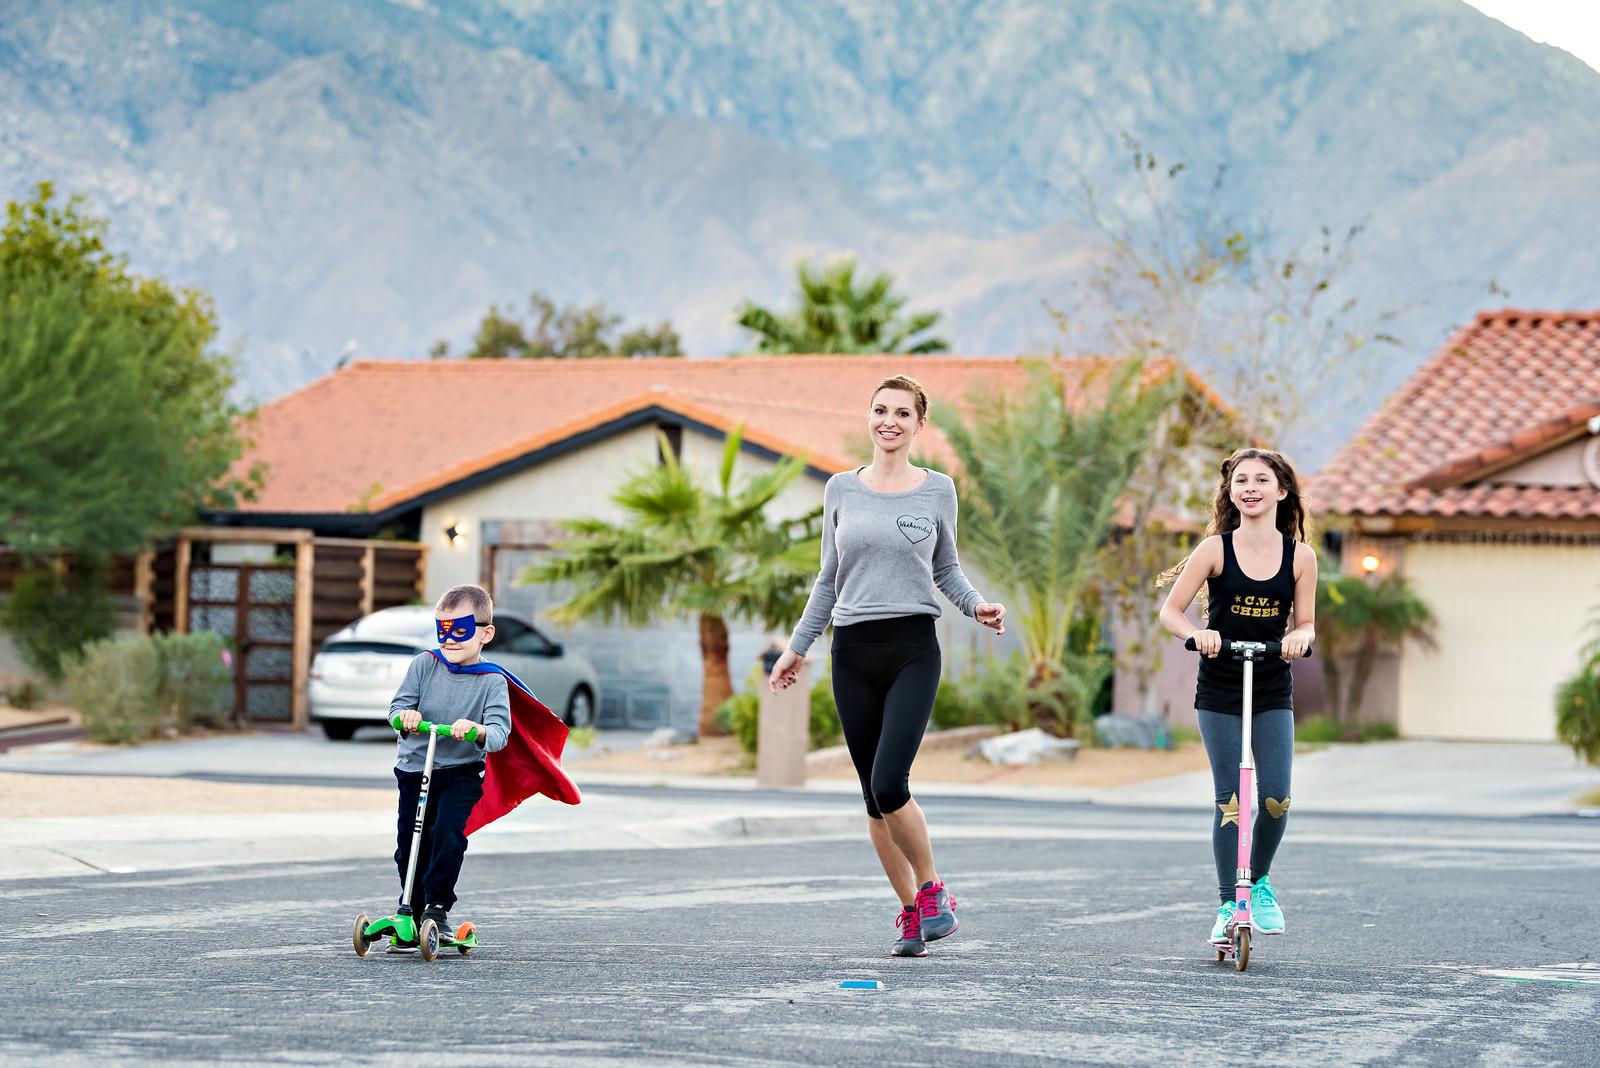 5 ways to keep kids active